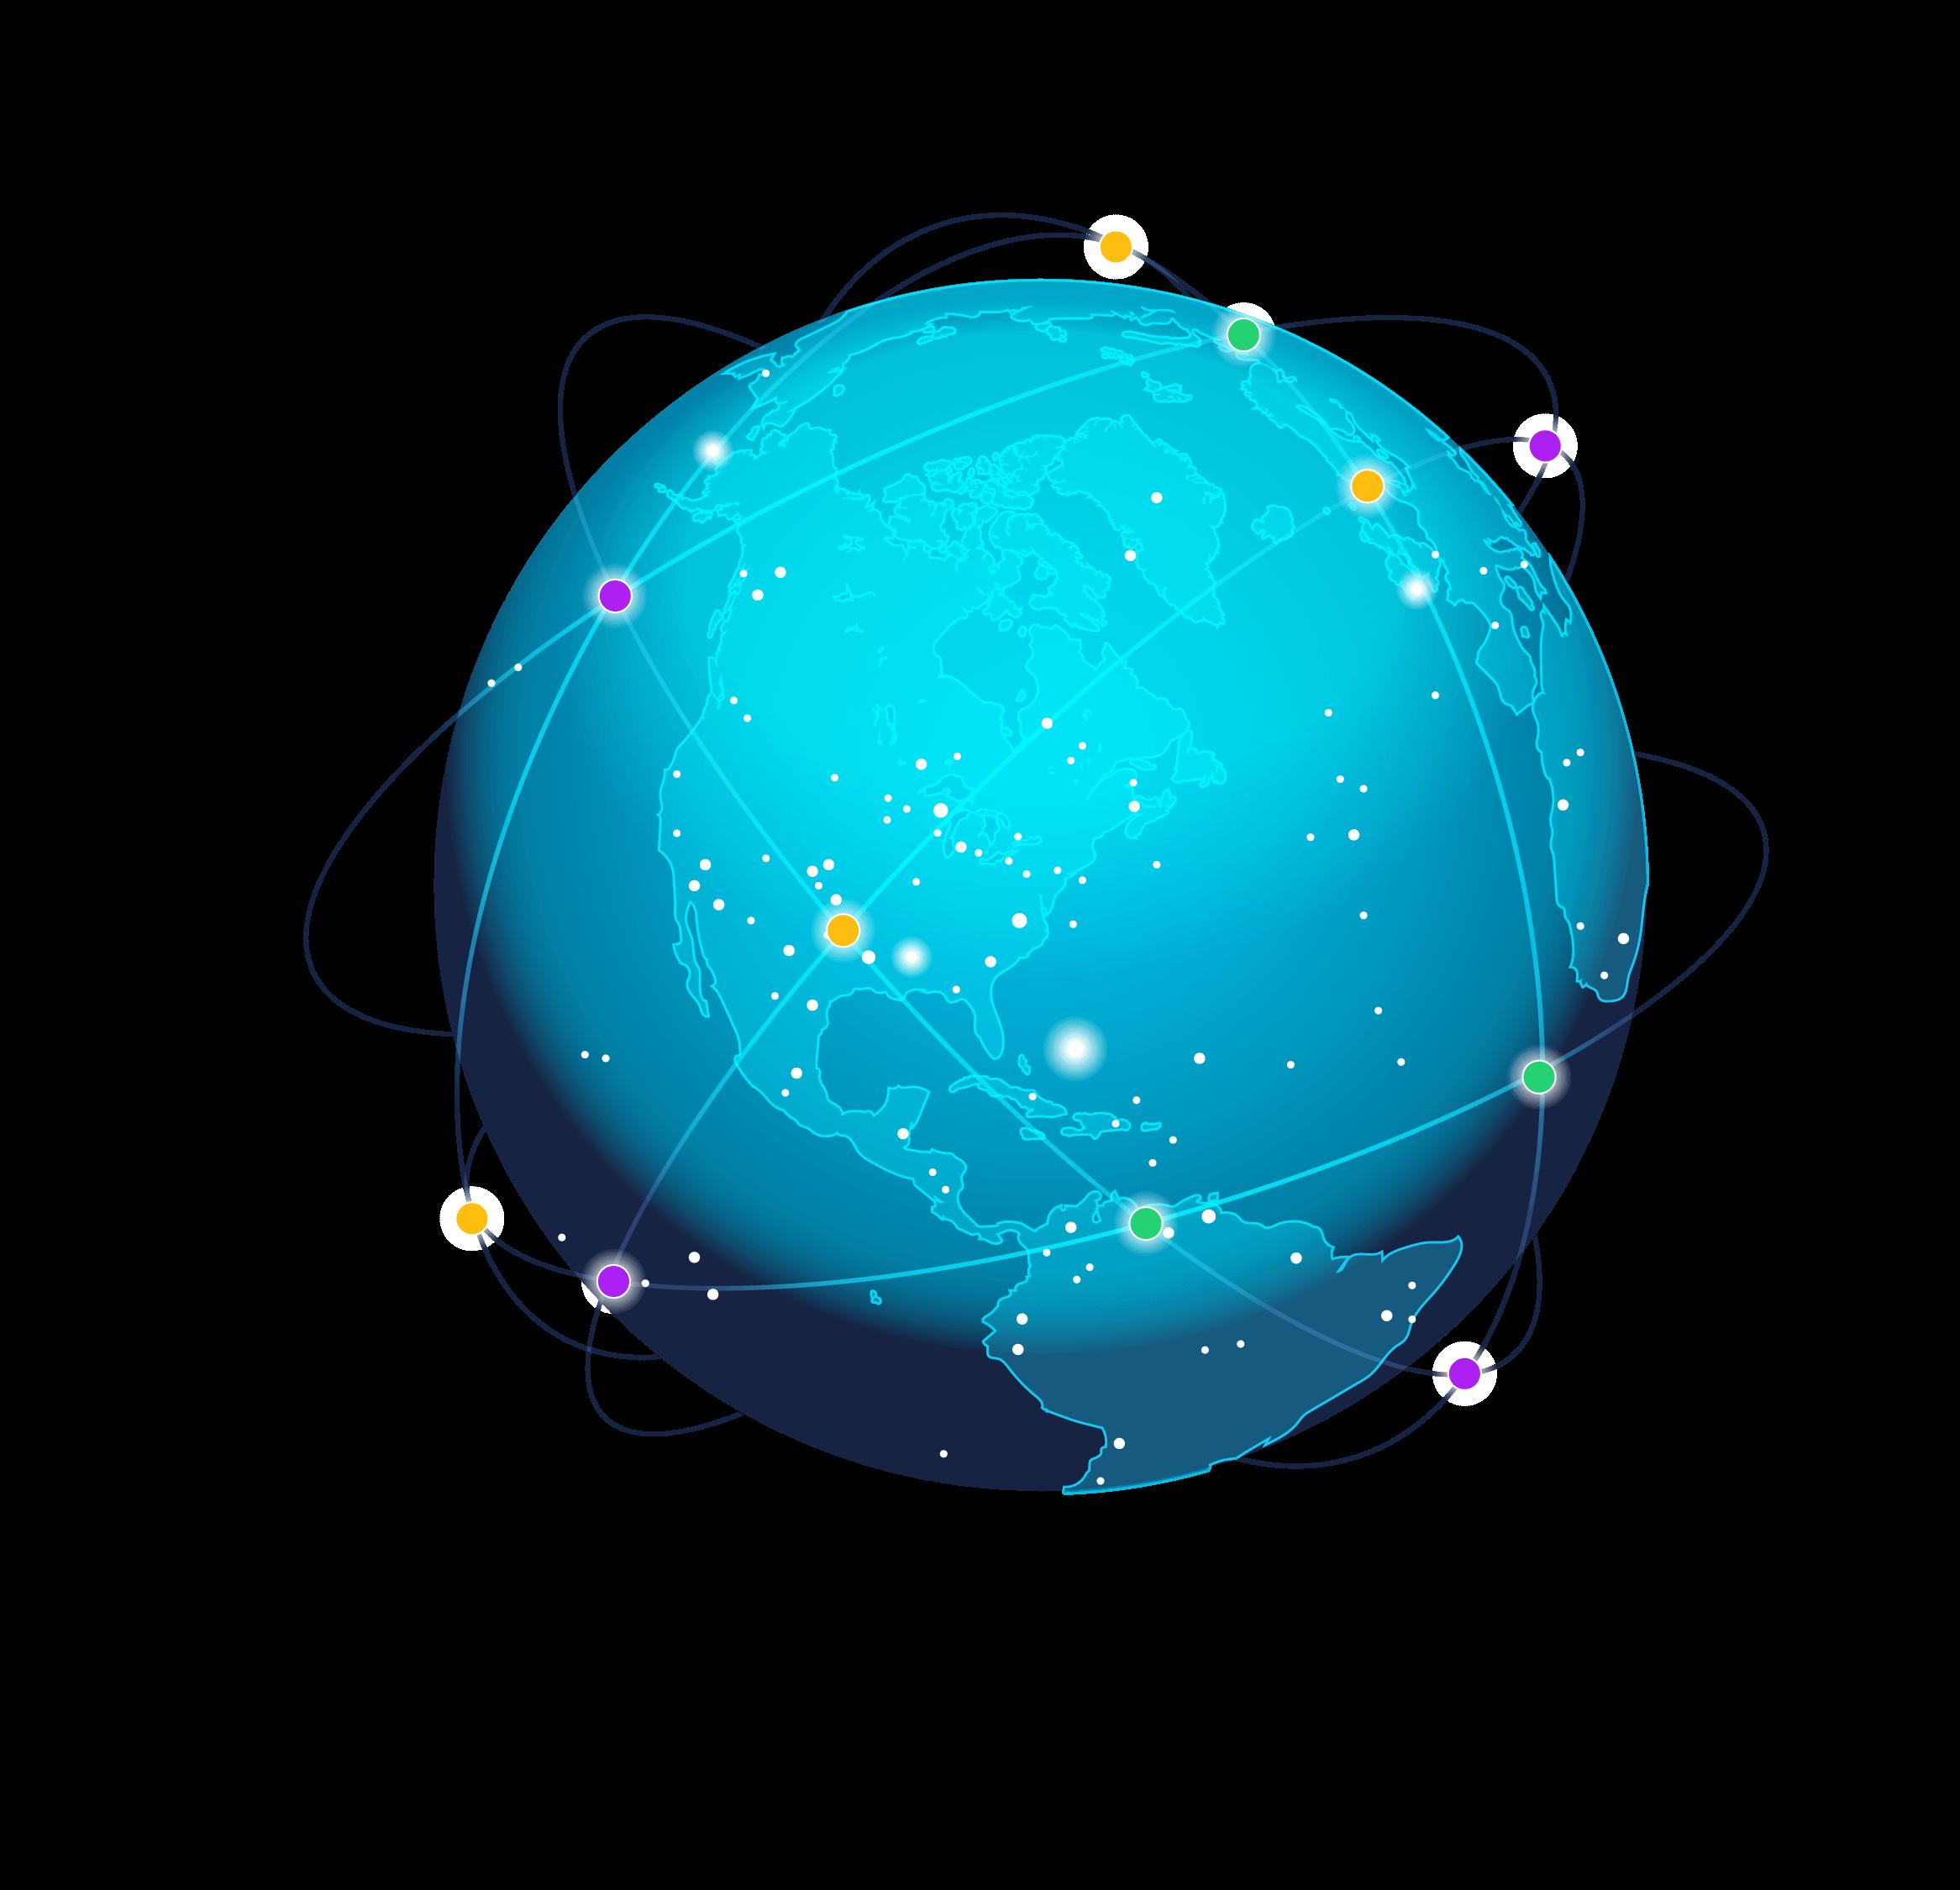 An illustration of a globe.